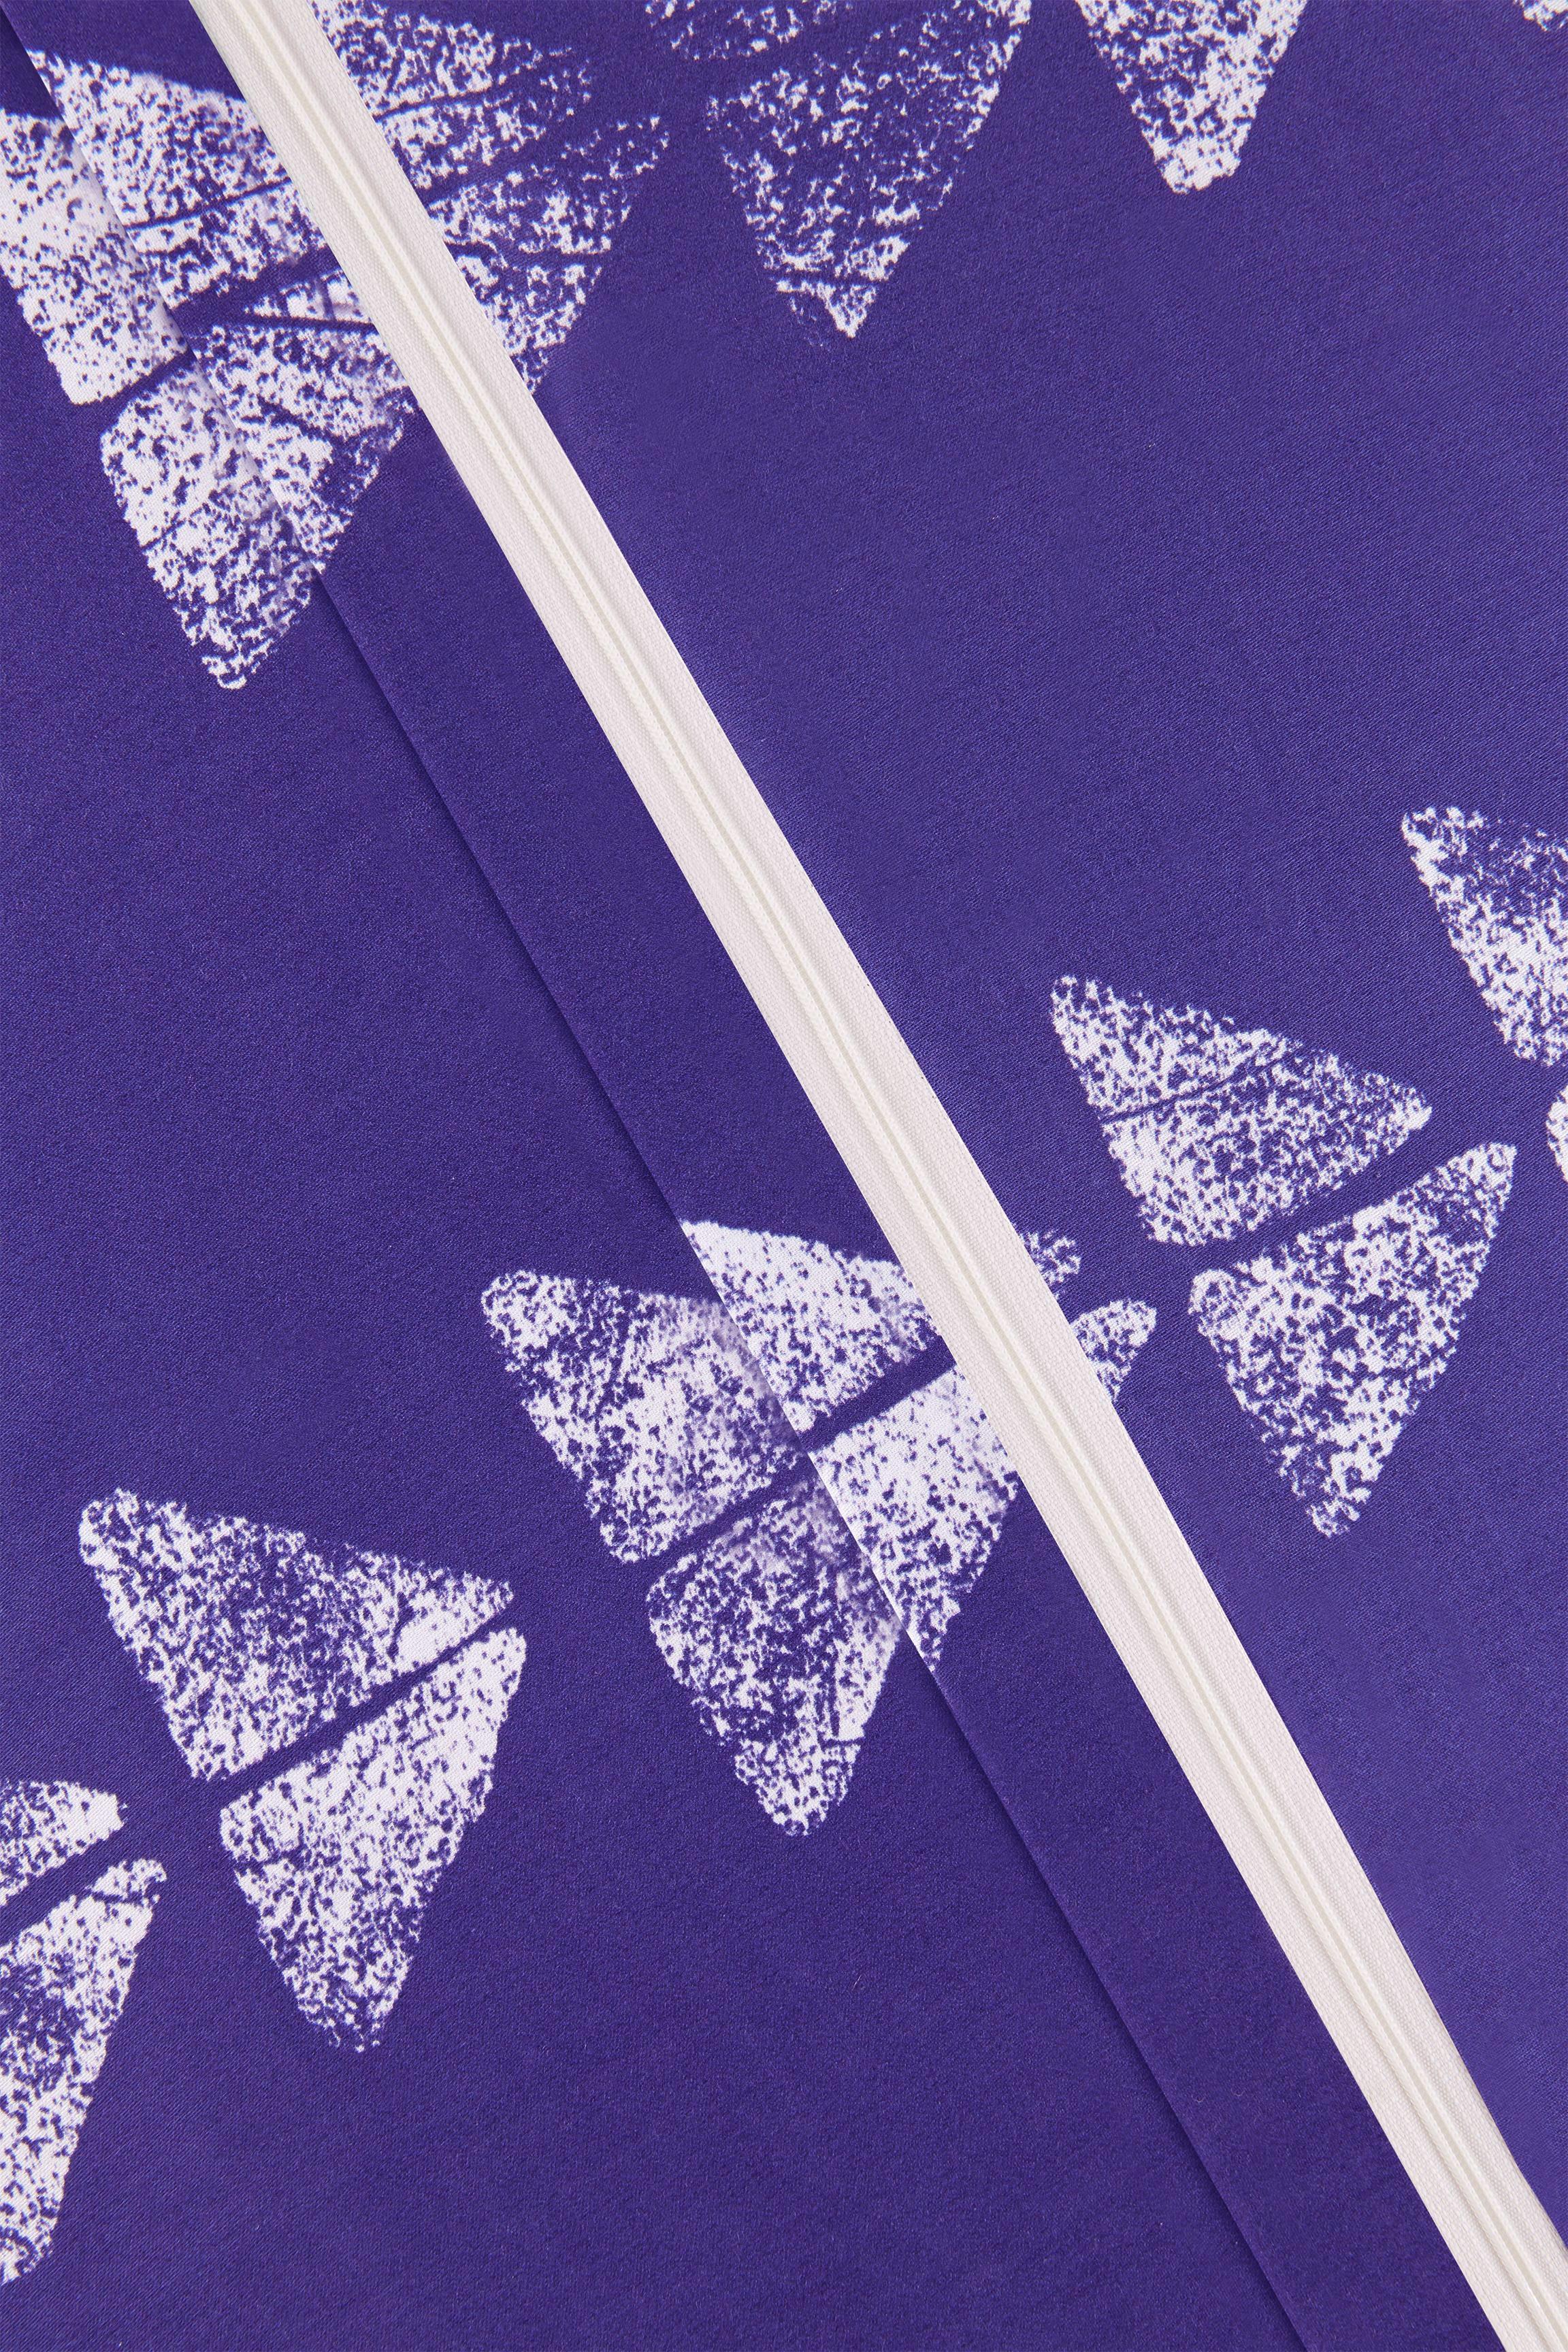 Bettwäsche Ulrich ca. 135x200cm - Blau, MODERN, Textil (135/200cm) - MÖMAX modern living